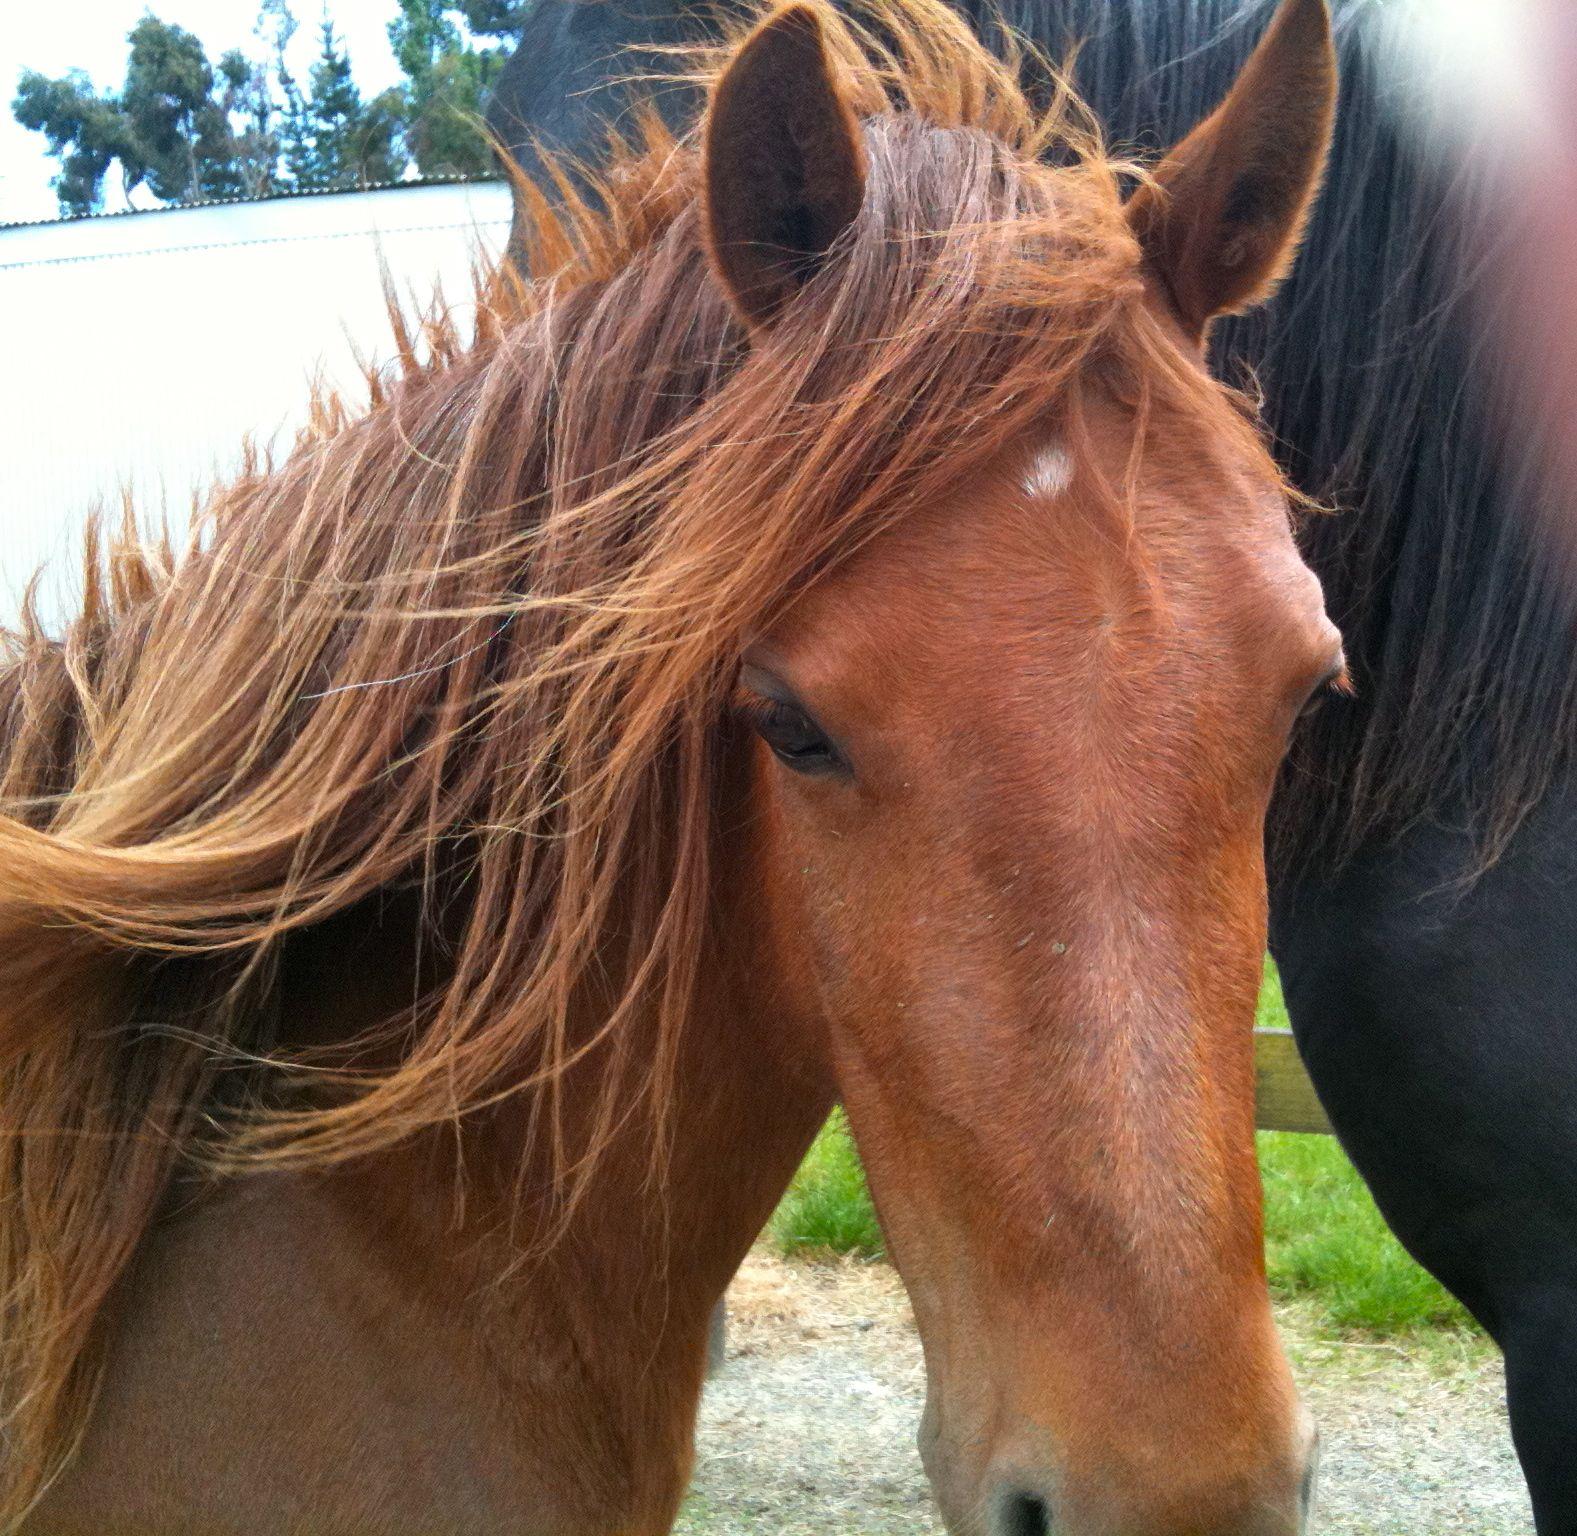 Horse school | DailyOxford